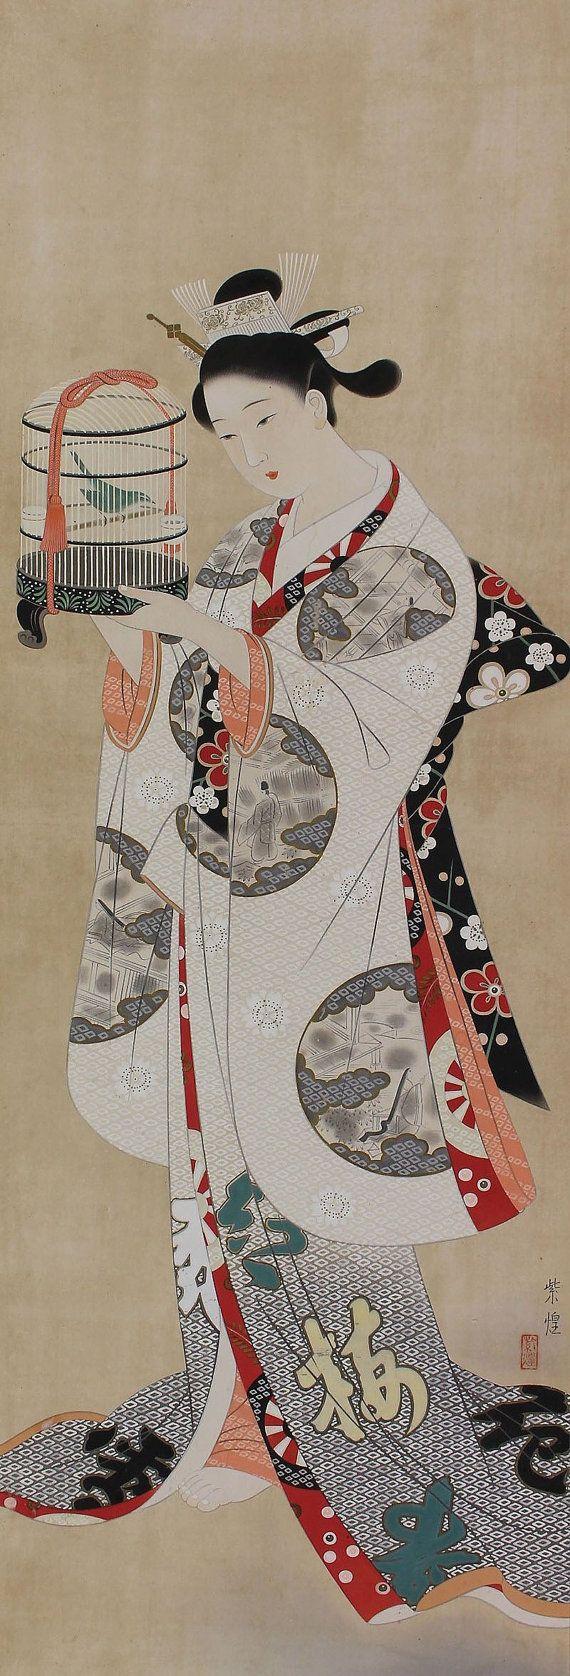 Japanese Fine Art Wall Hanging Scroll Painting Bijin-ga Beauty in Kimono admiring the bird Kakejiku – 1507205